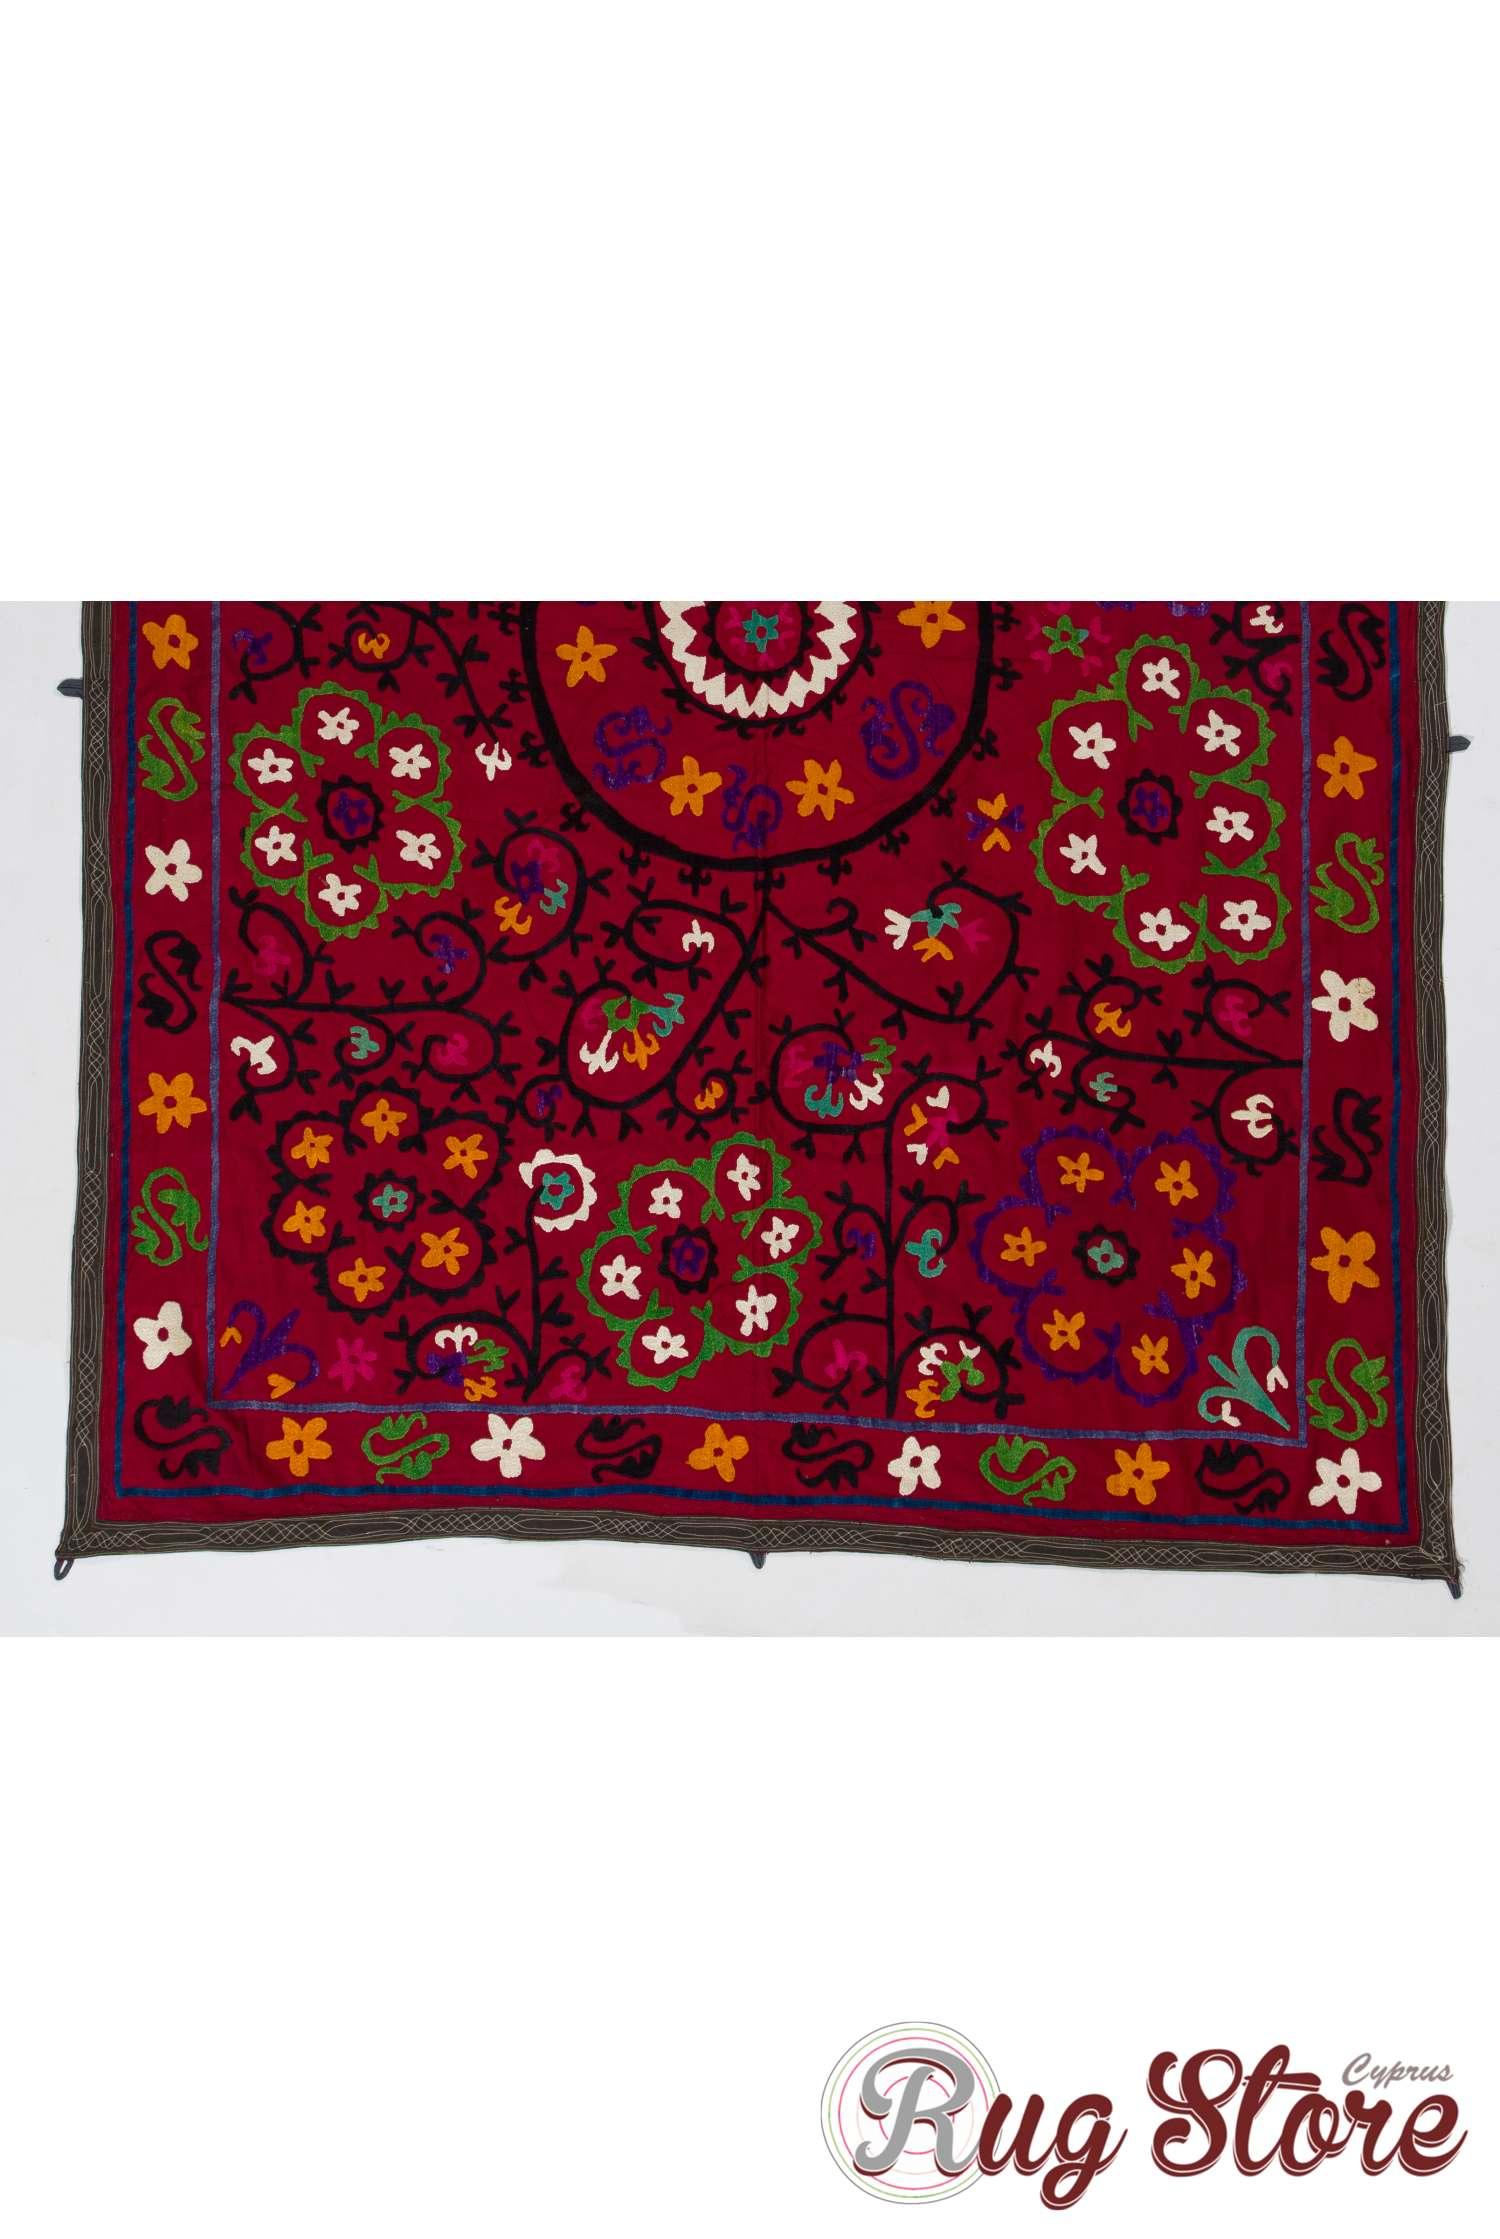 Vintage UZBEK Traditional Clothing Handmade Costum 140x75 cm 55/' x 30/' FREE SHIPPING